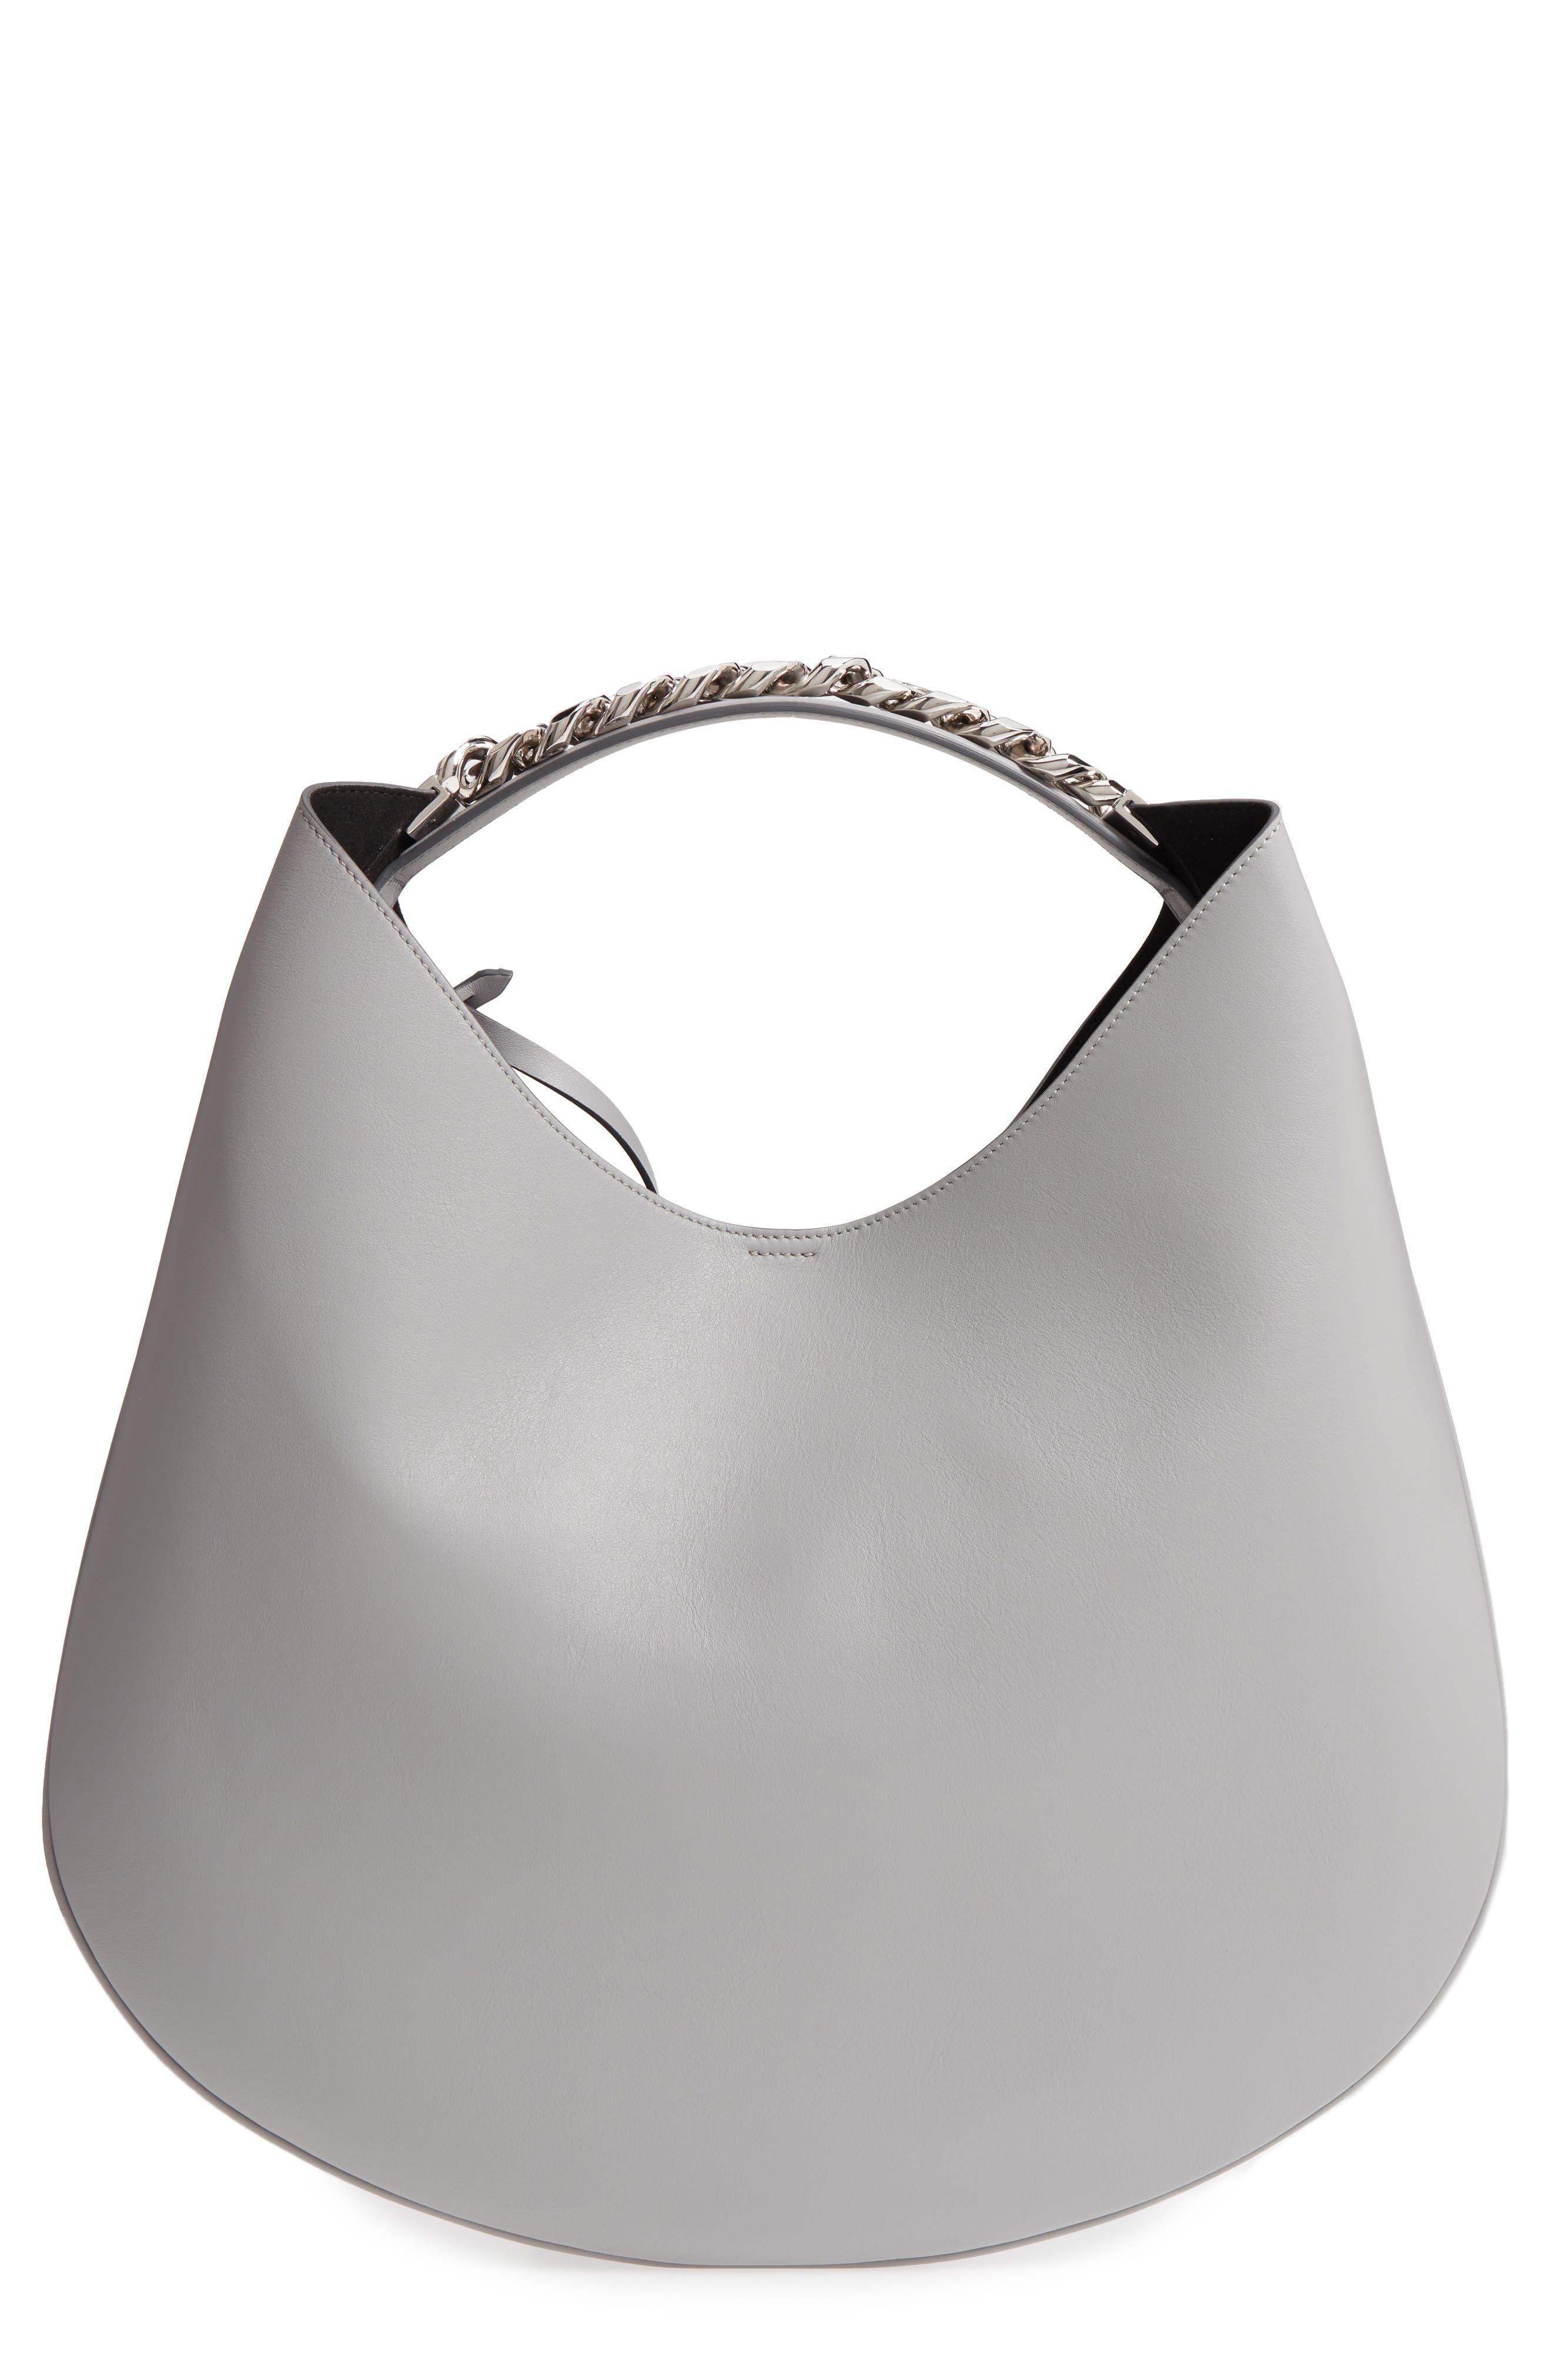 Medium Infinity Calfskin Leather Hobo,                             Main thumbnail 1, color,                             Pearl Grey